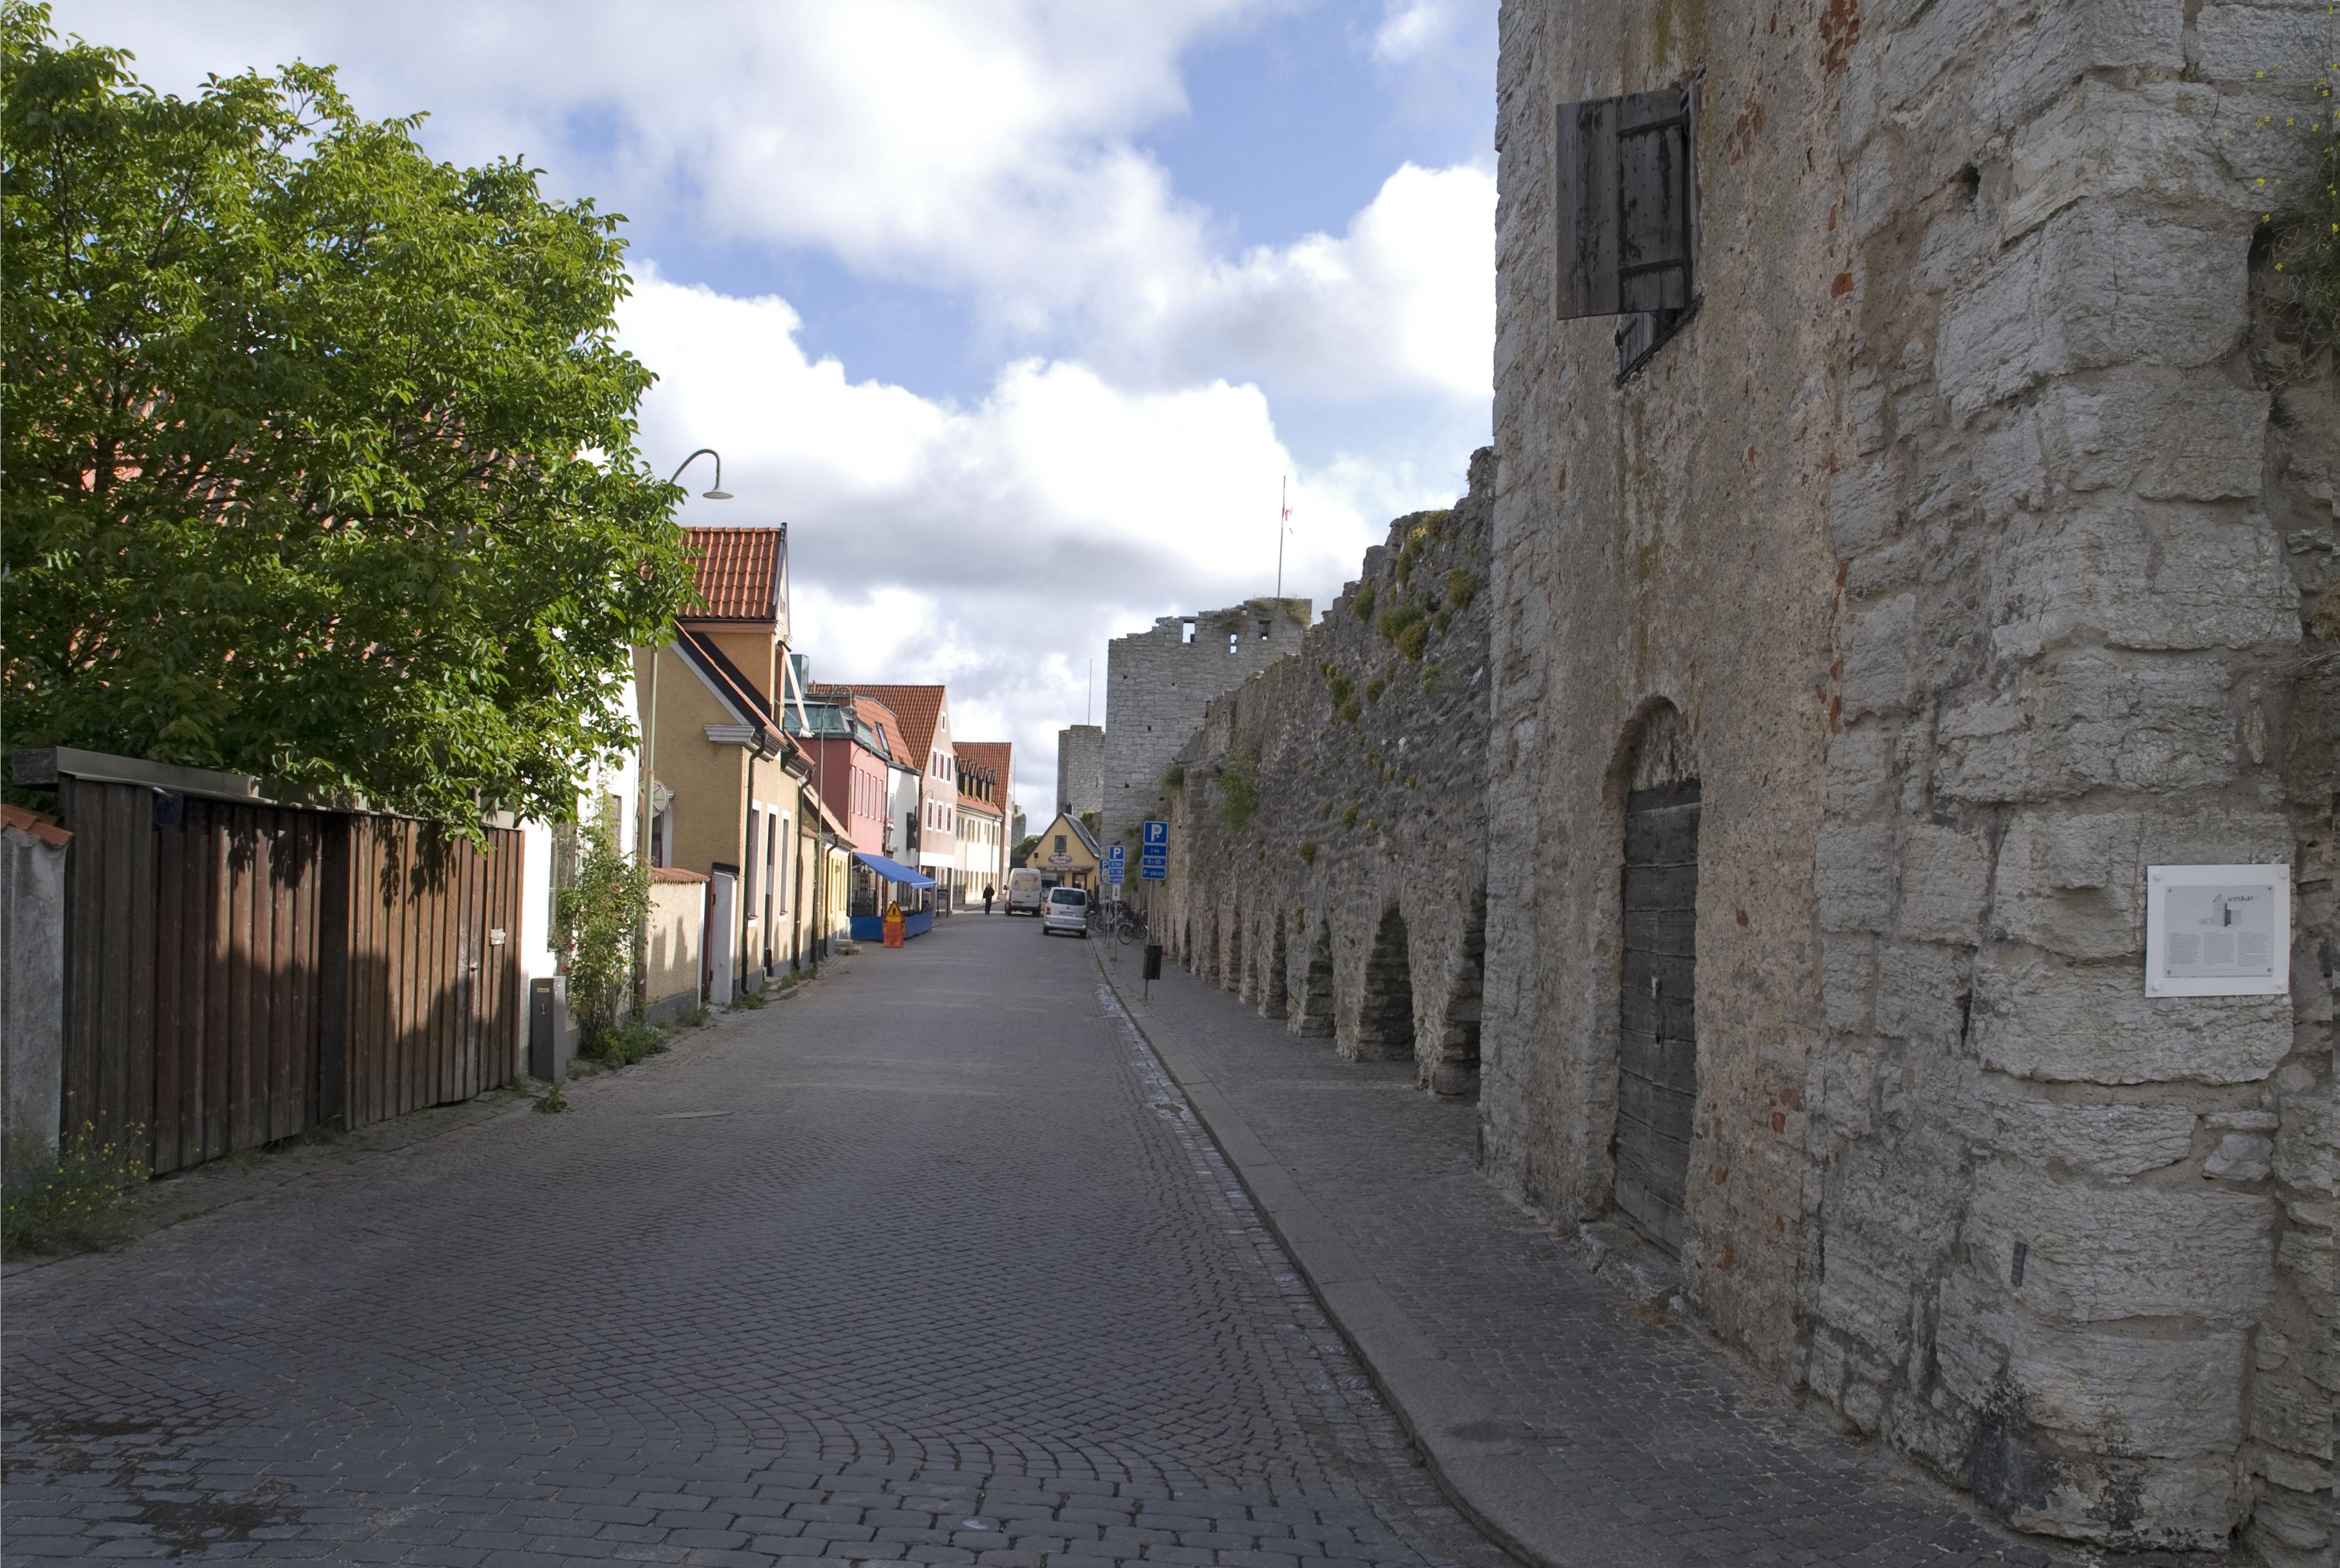 Sveriges äldsta stad - visby gotland